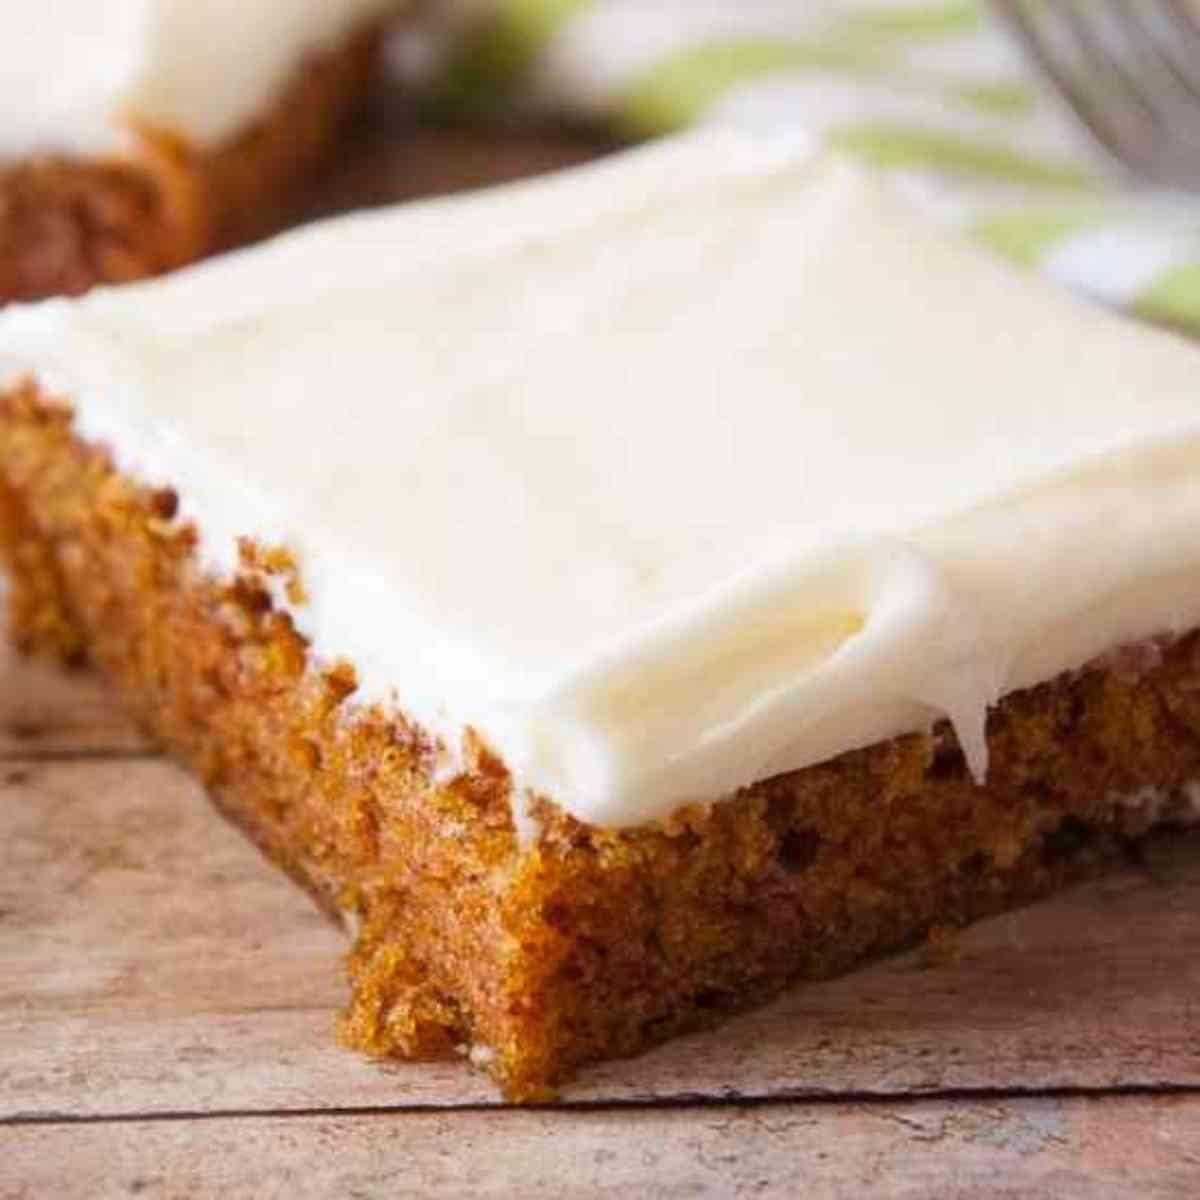 Piece of carrot cake.